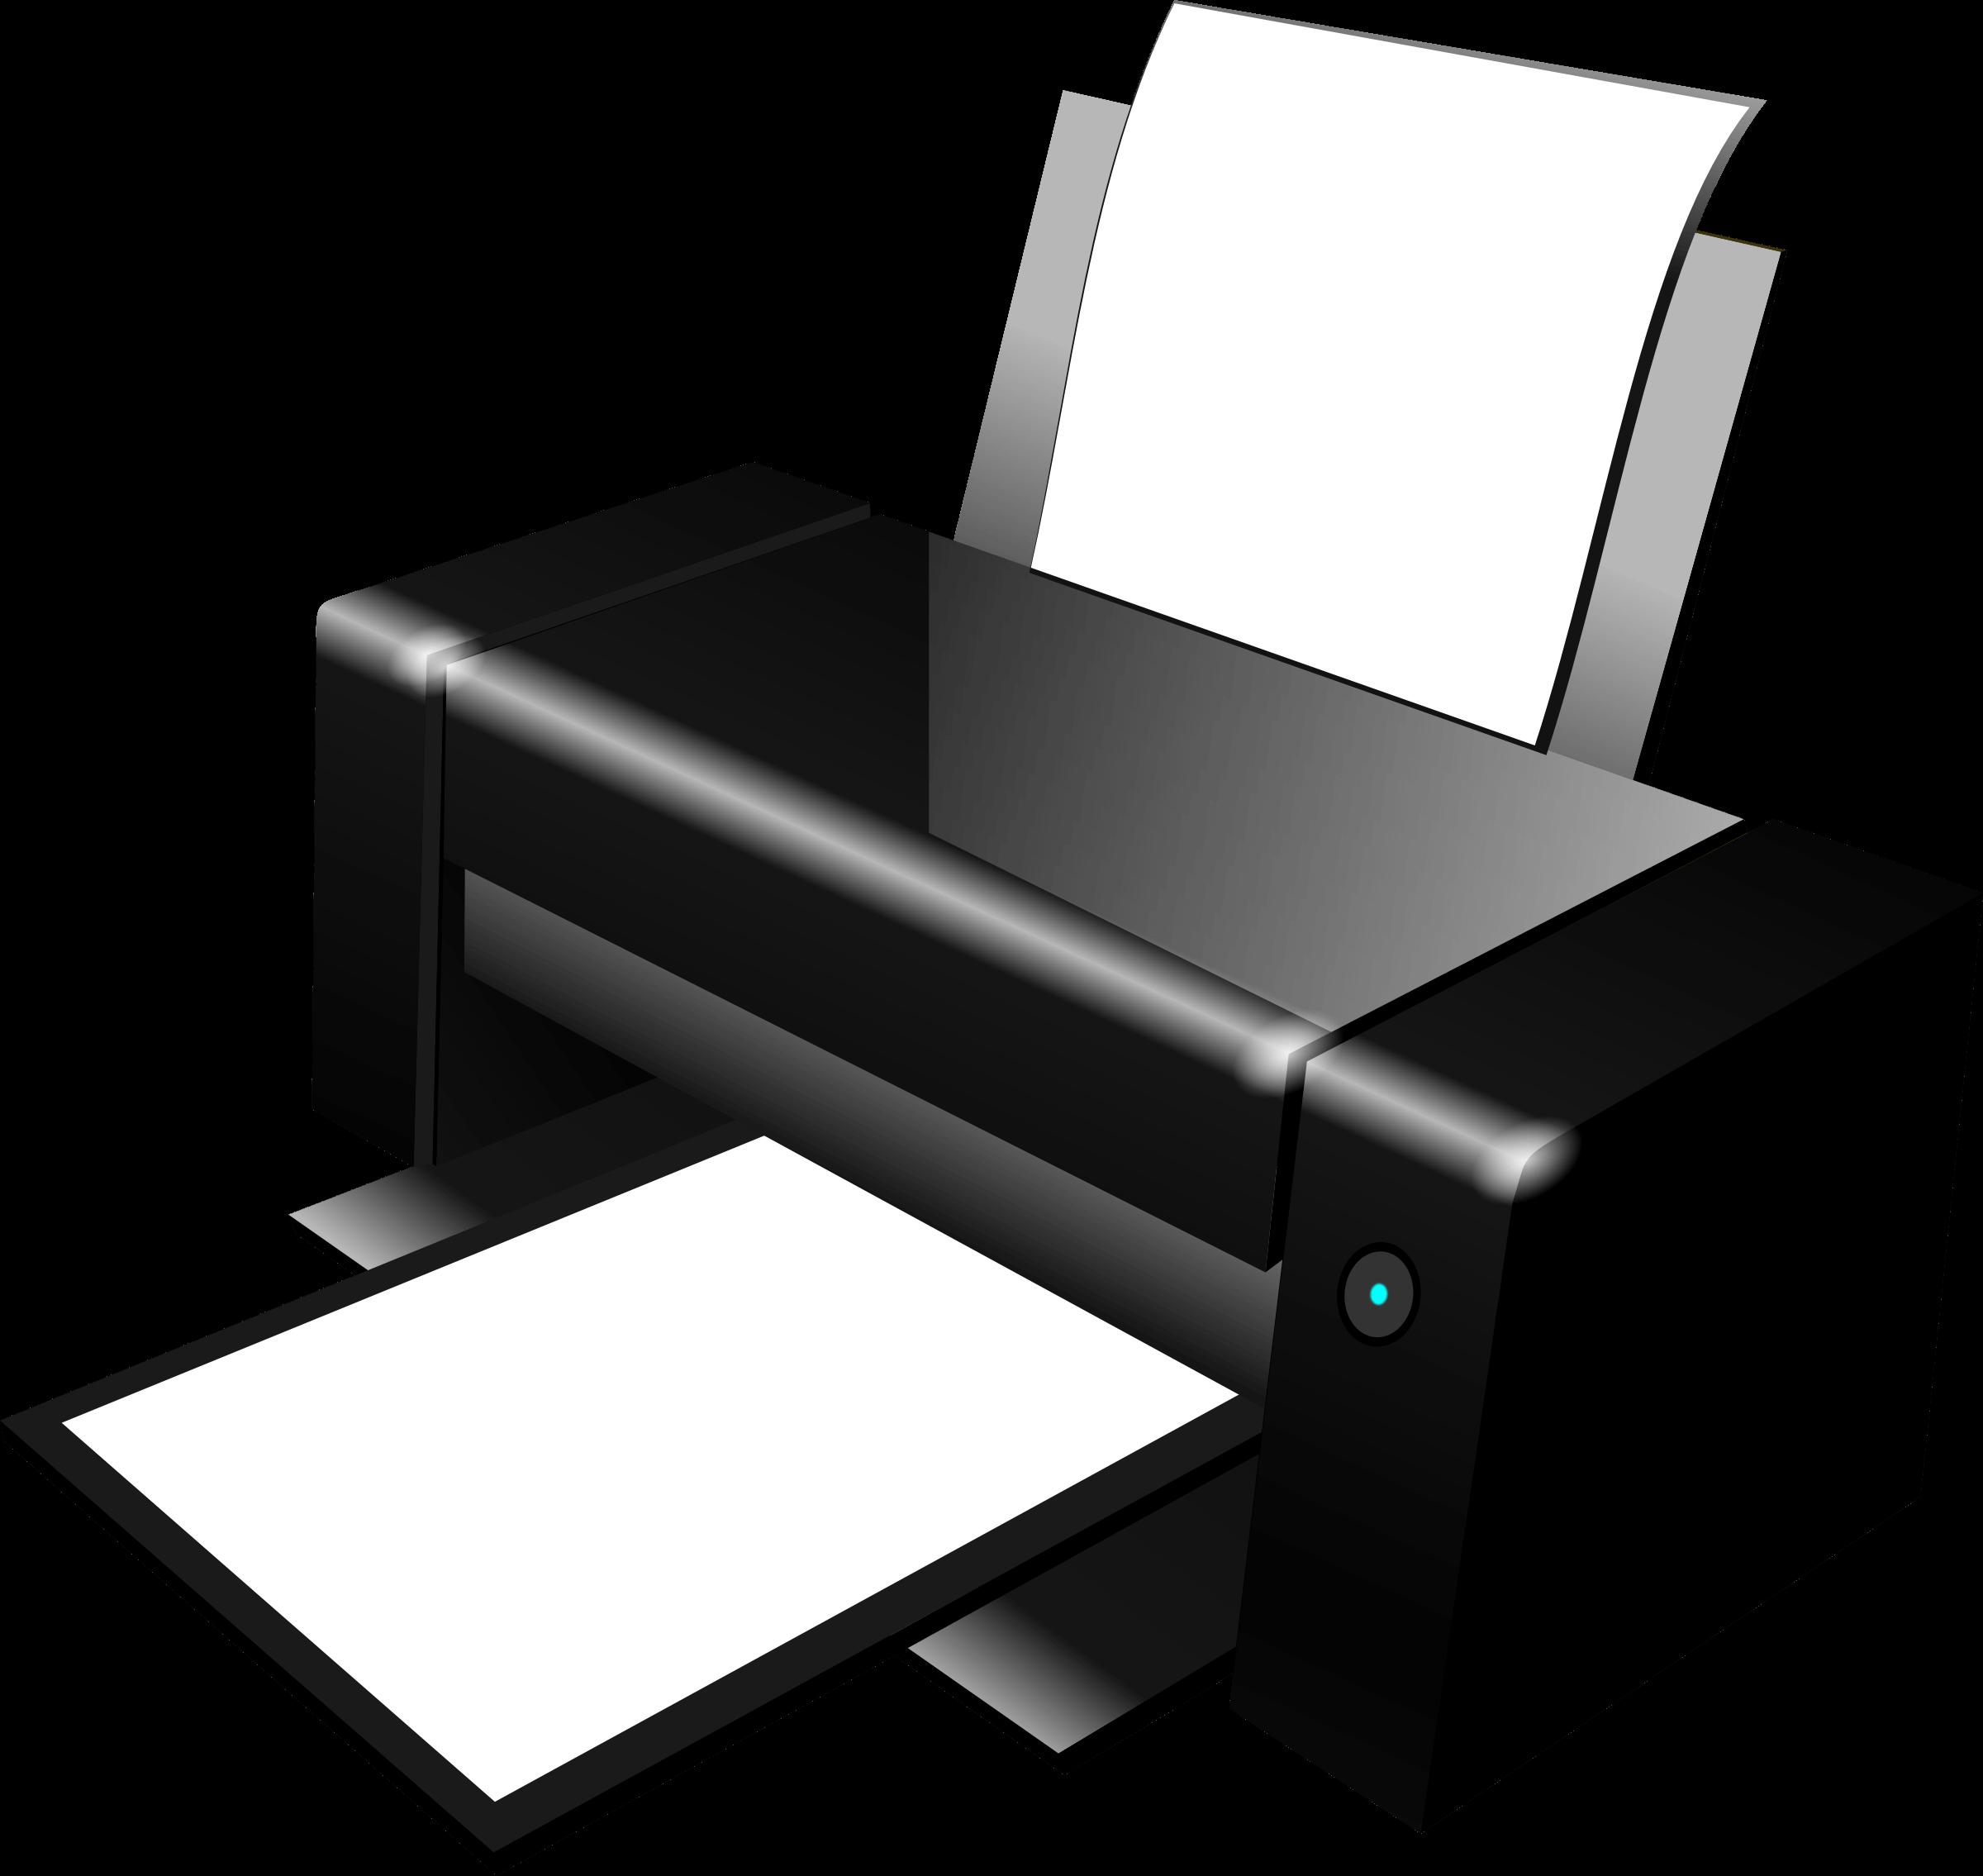 Printer clipart images clip art freeuse stock Black Clipart Printer transparent PNG - StickPNG clip art freeuse stock